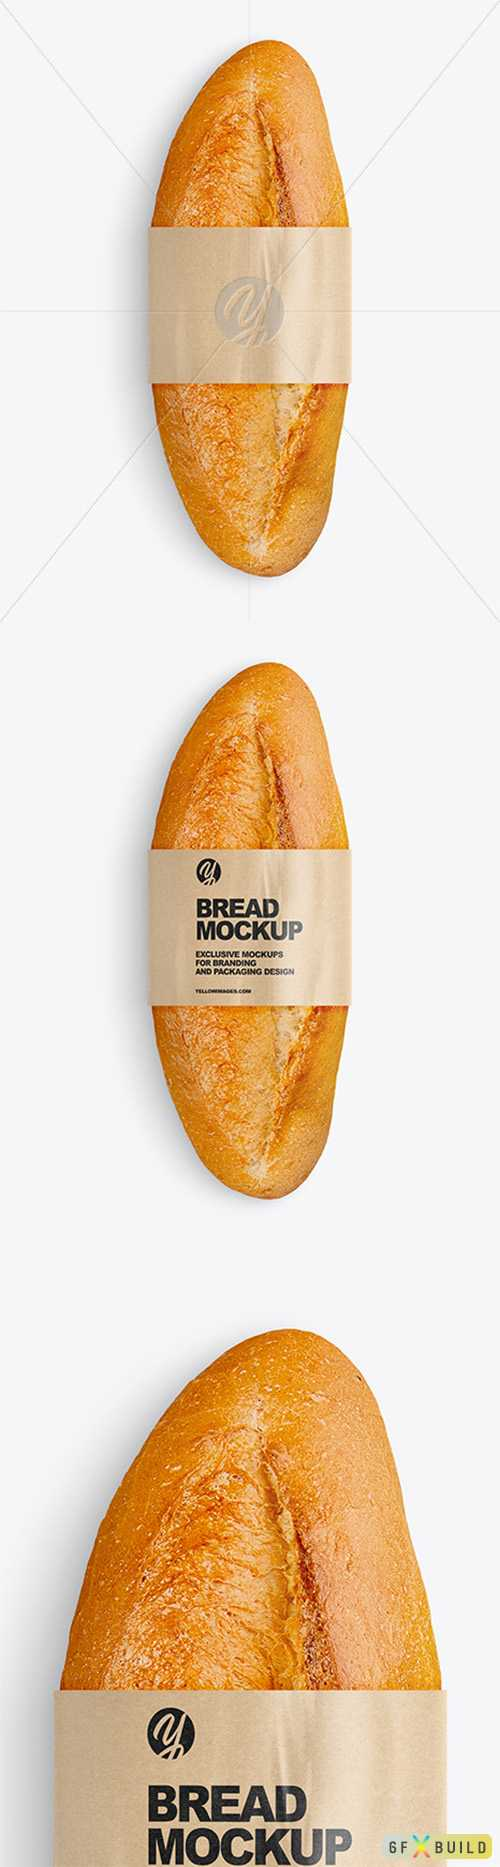 Bread with Label Mockup 76797 TIF